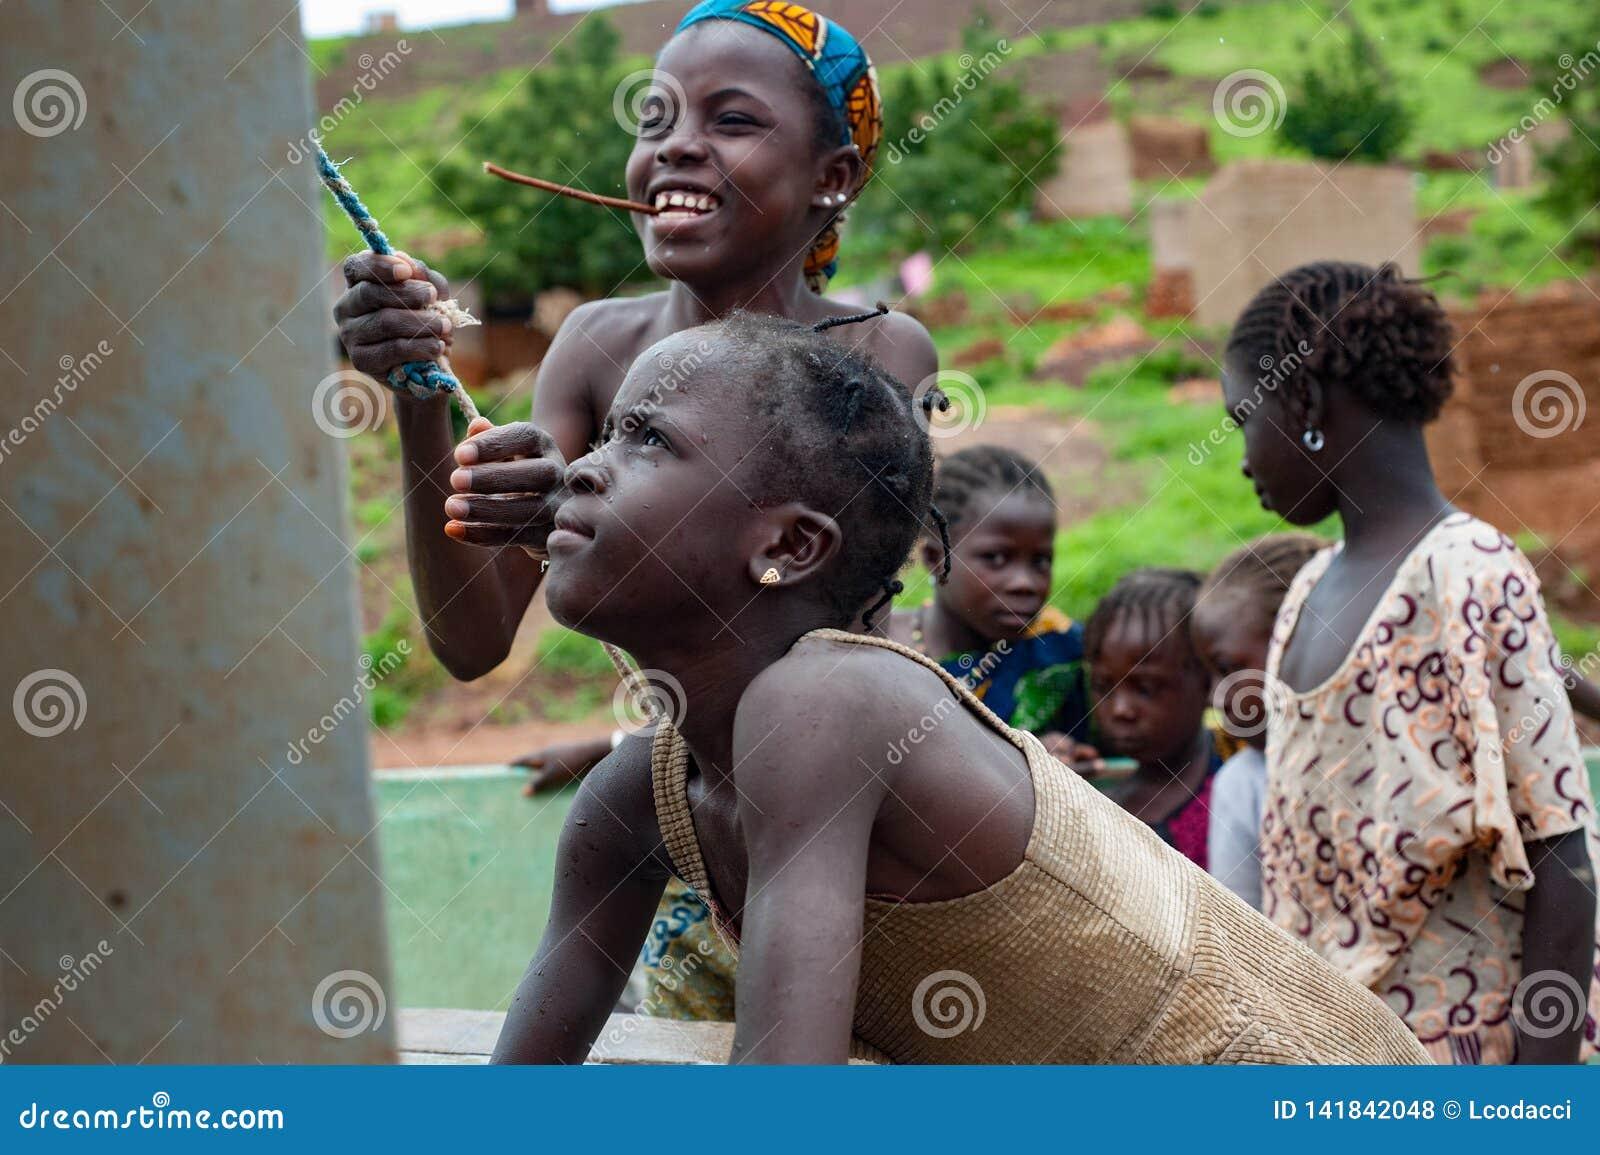 African Rudimentary Well Near Bamako Editorial Stock Photo Image Of Life Famine 141842048